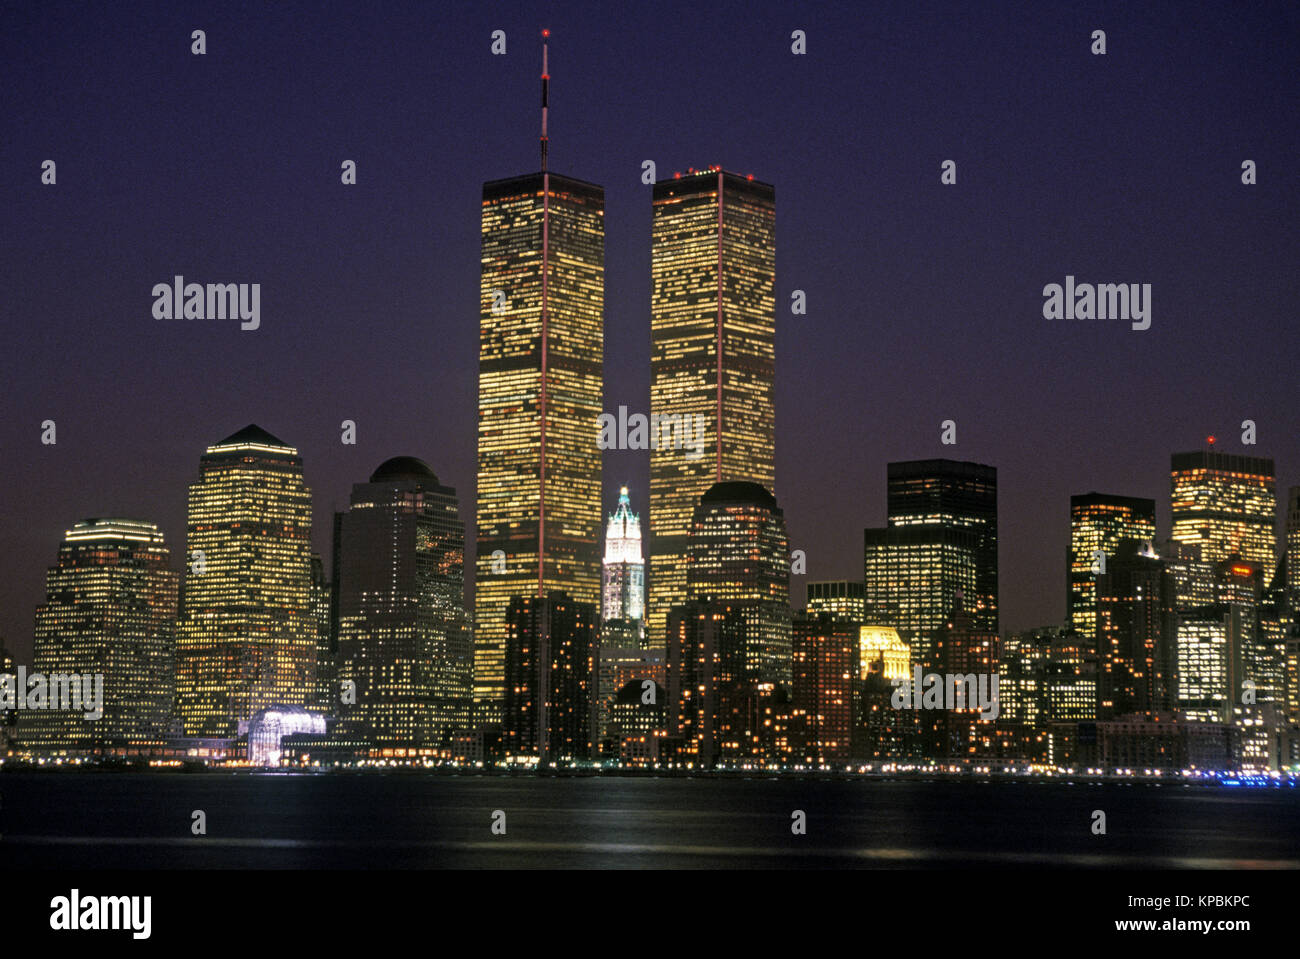 1988 HISTORICAL TWIN TOWERS (©MINORU YAMASAKI 1973) DOWNTOWN SKYLINE HUDSON RIVER MANHATTAN NEW YORK CITY USA - Stock Image